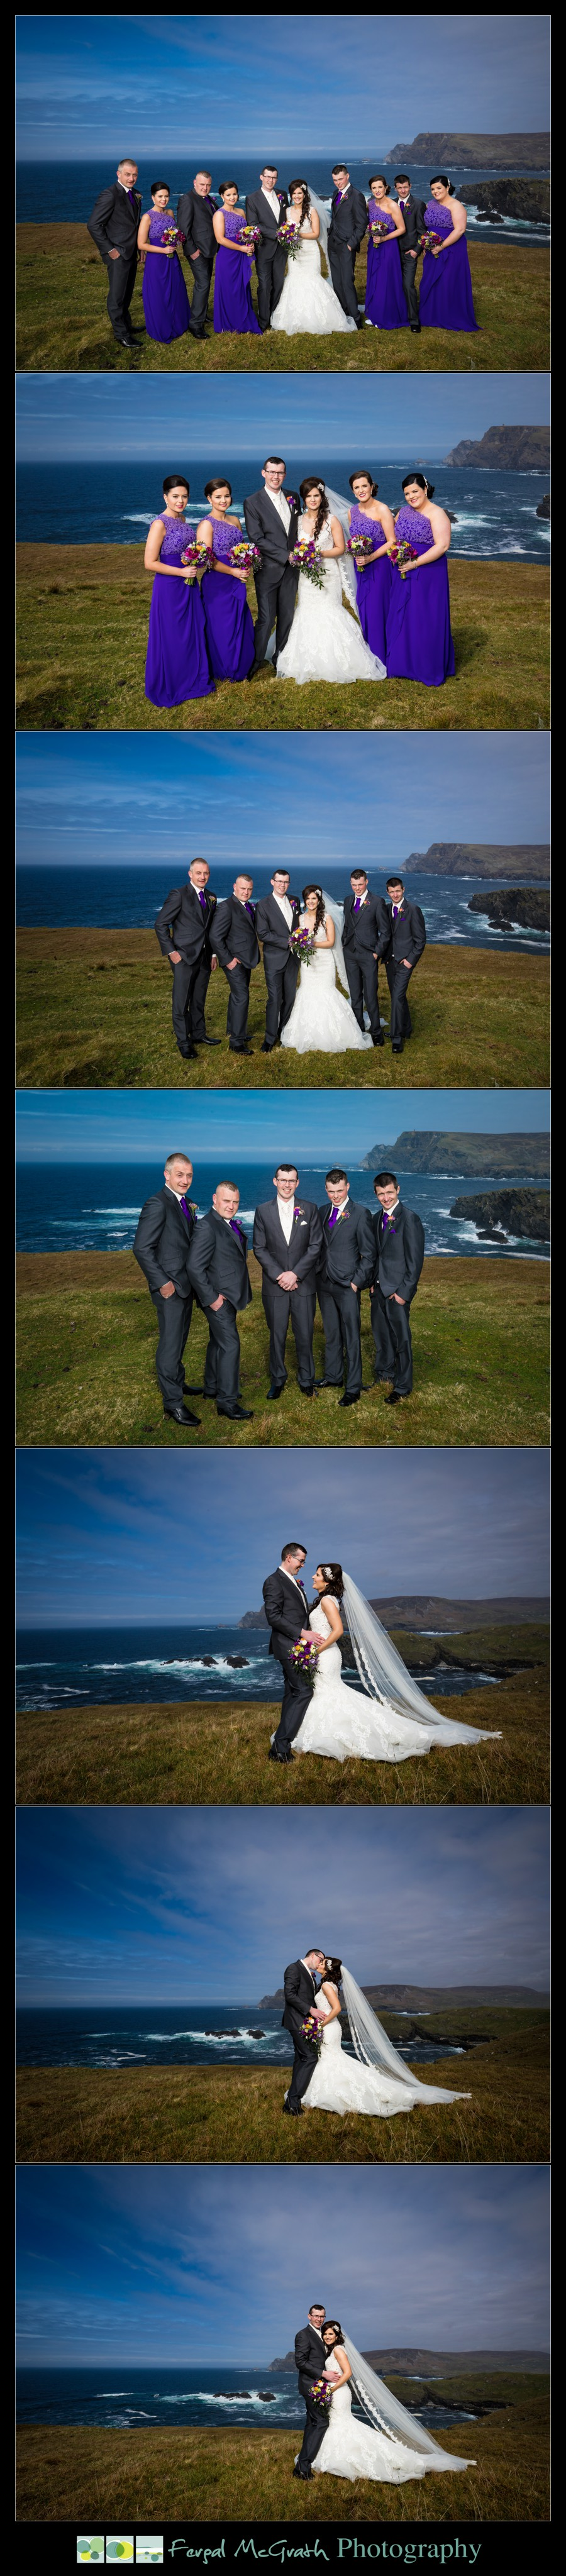 Glencolmcille wedding amazing wedding photos taken at glencolmcille head in county donegal ireland